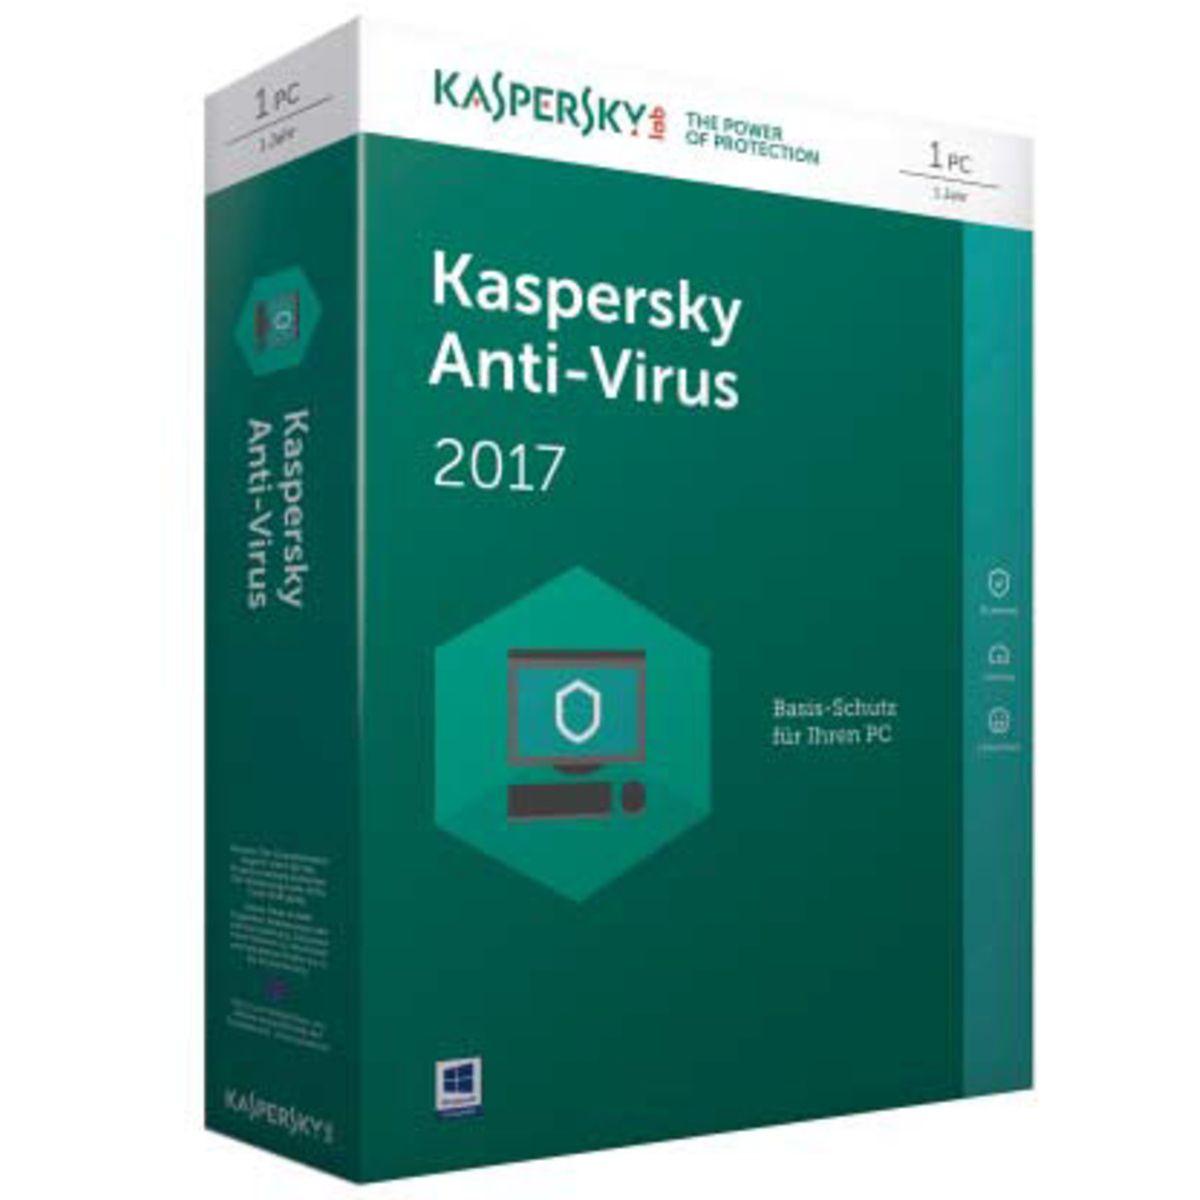 Kaspersky Sicherheits-Software »Anti-Virus 2017 Mini-Box 1 User«